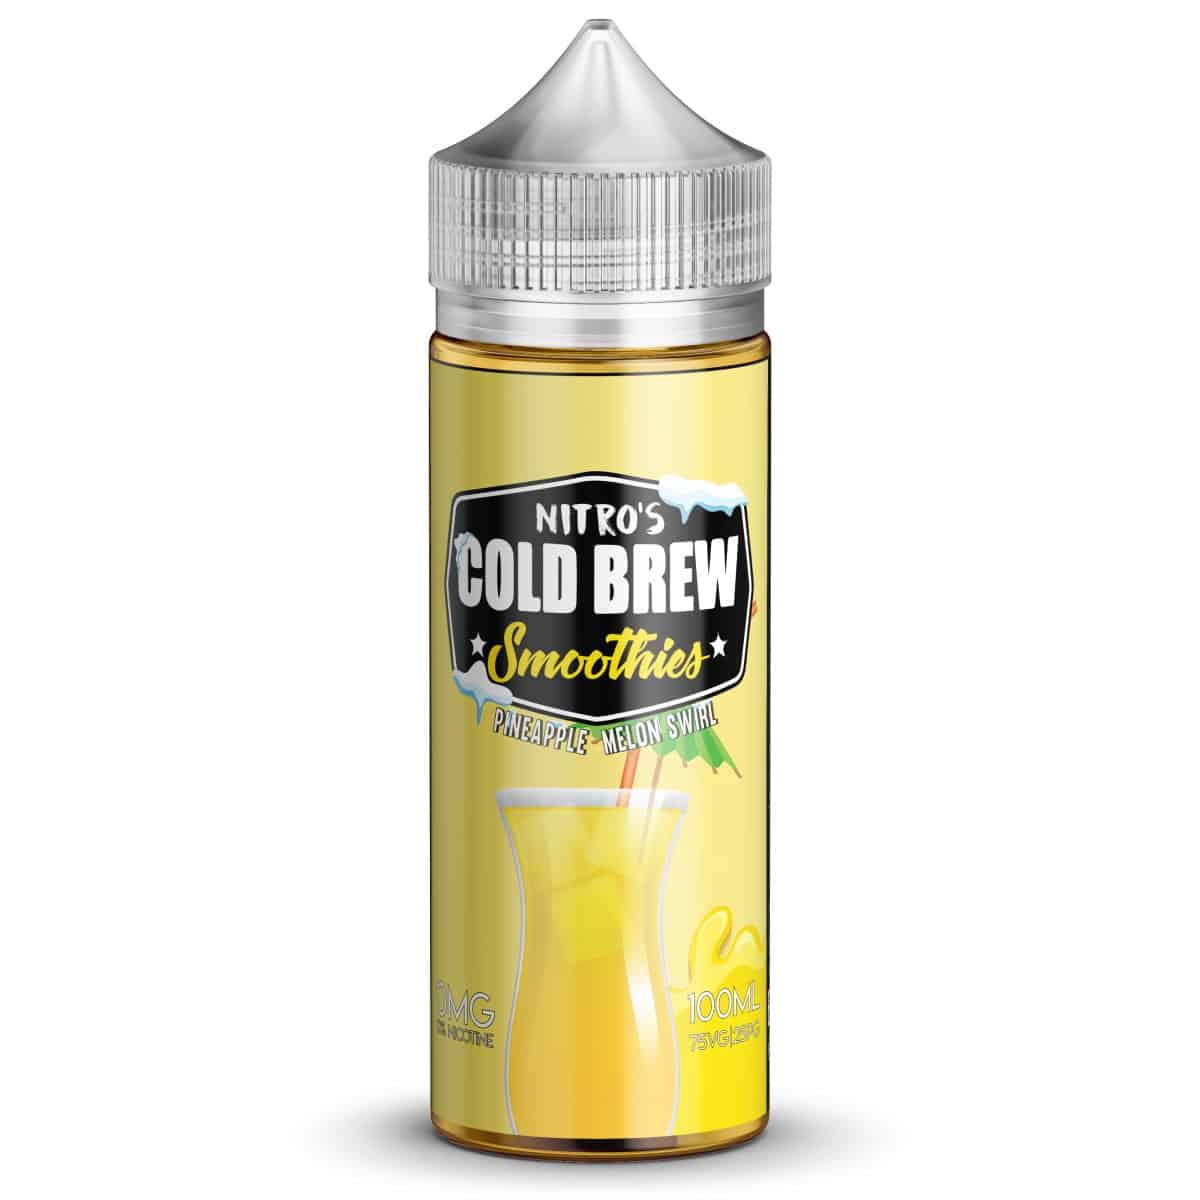 Pineapple Melon Swirl Nitros Cold Brew Smoothies Shortfill 100ml